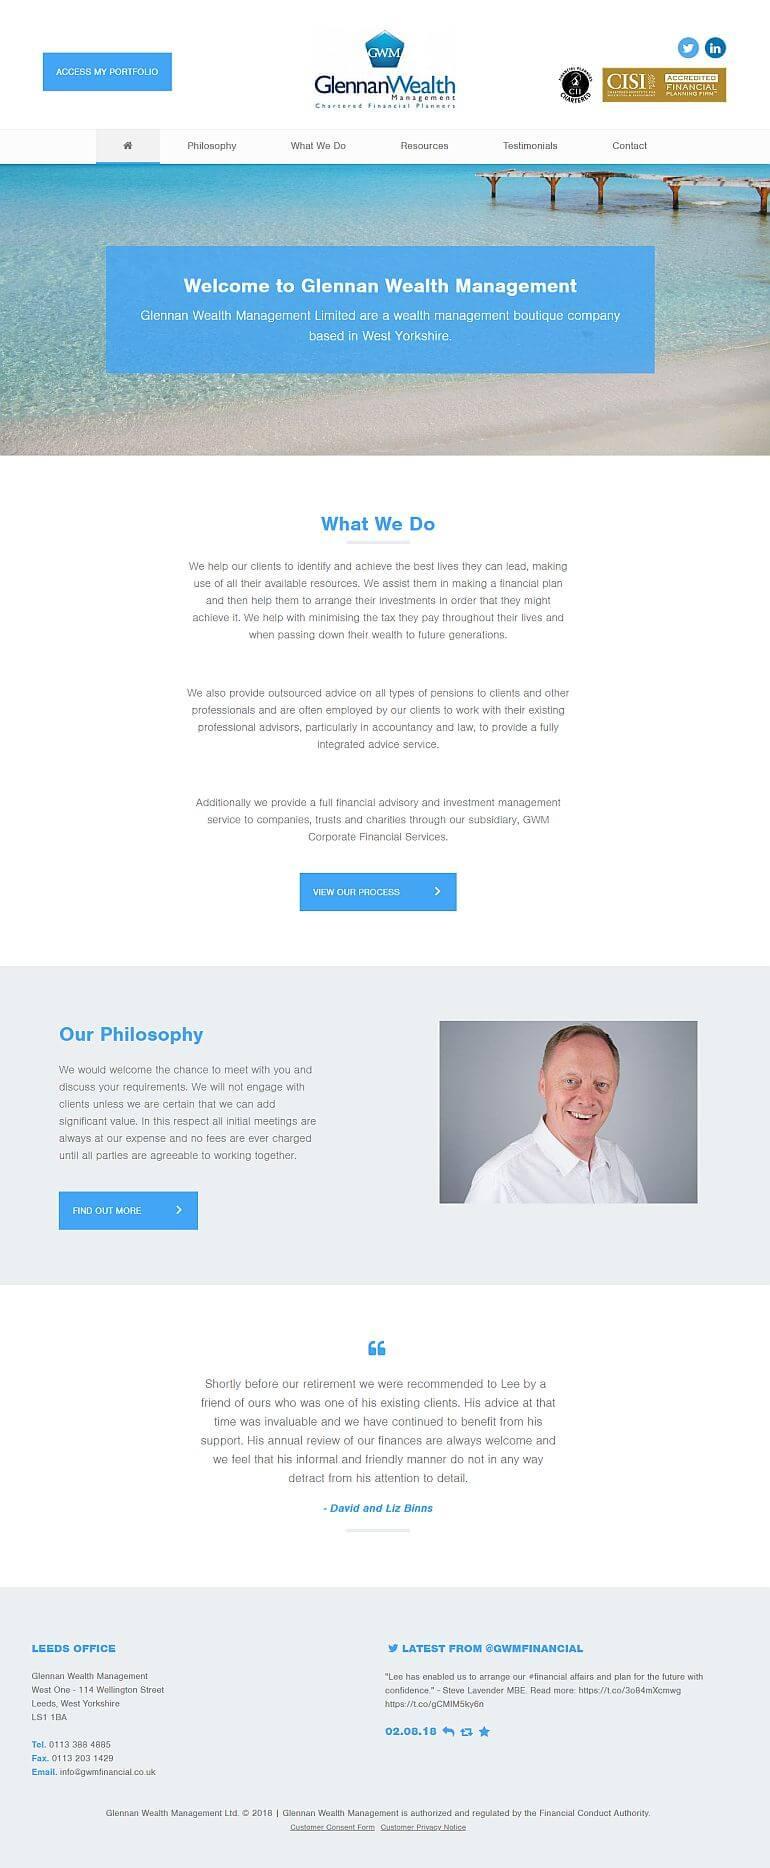 Previous Website For Glennan Wealth Management Ltd